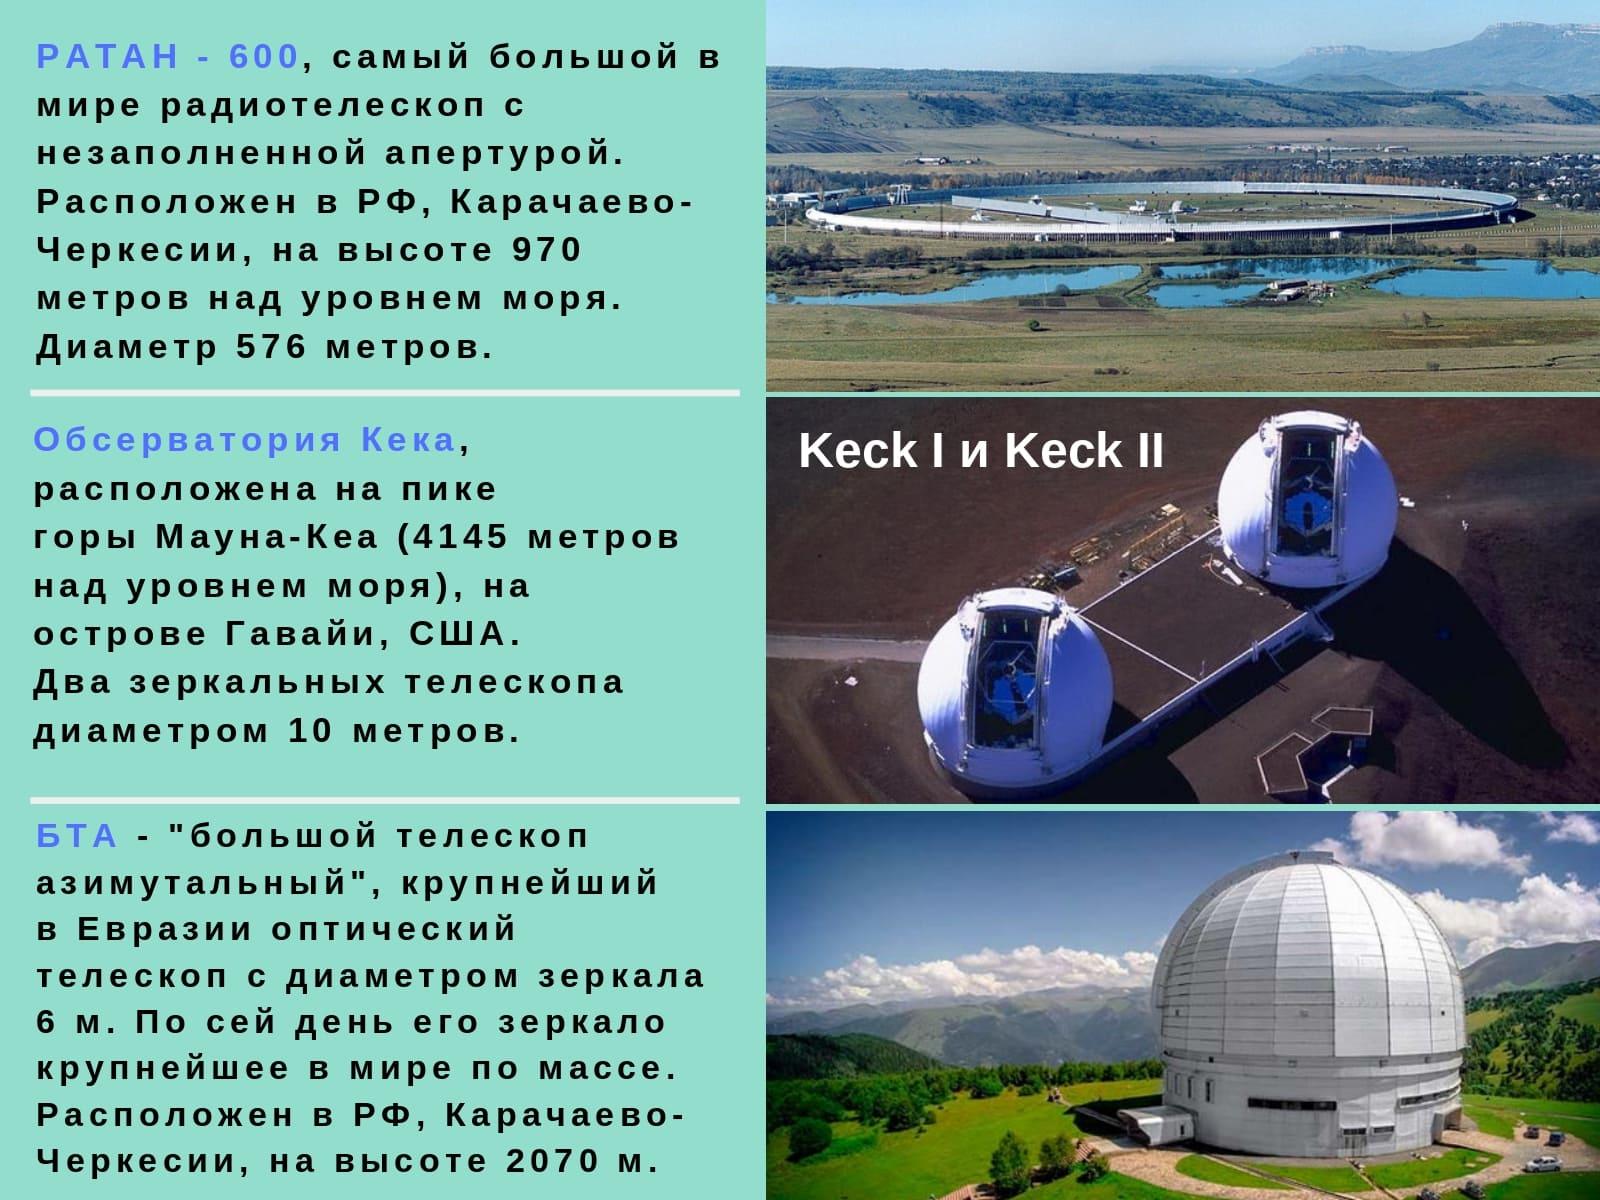 РАТАН - 600 / Обсерватория Кека / БТА